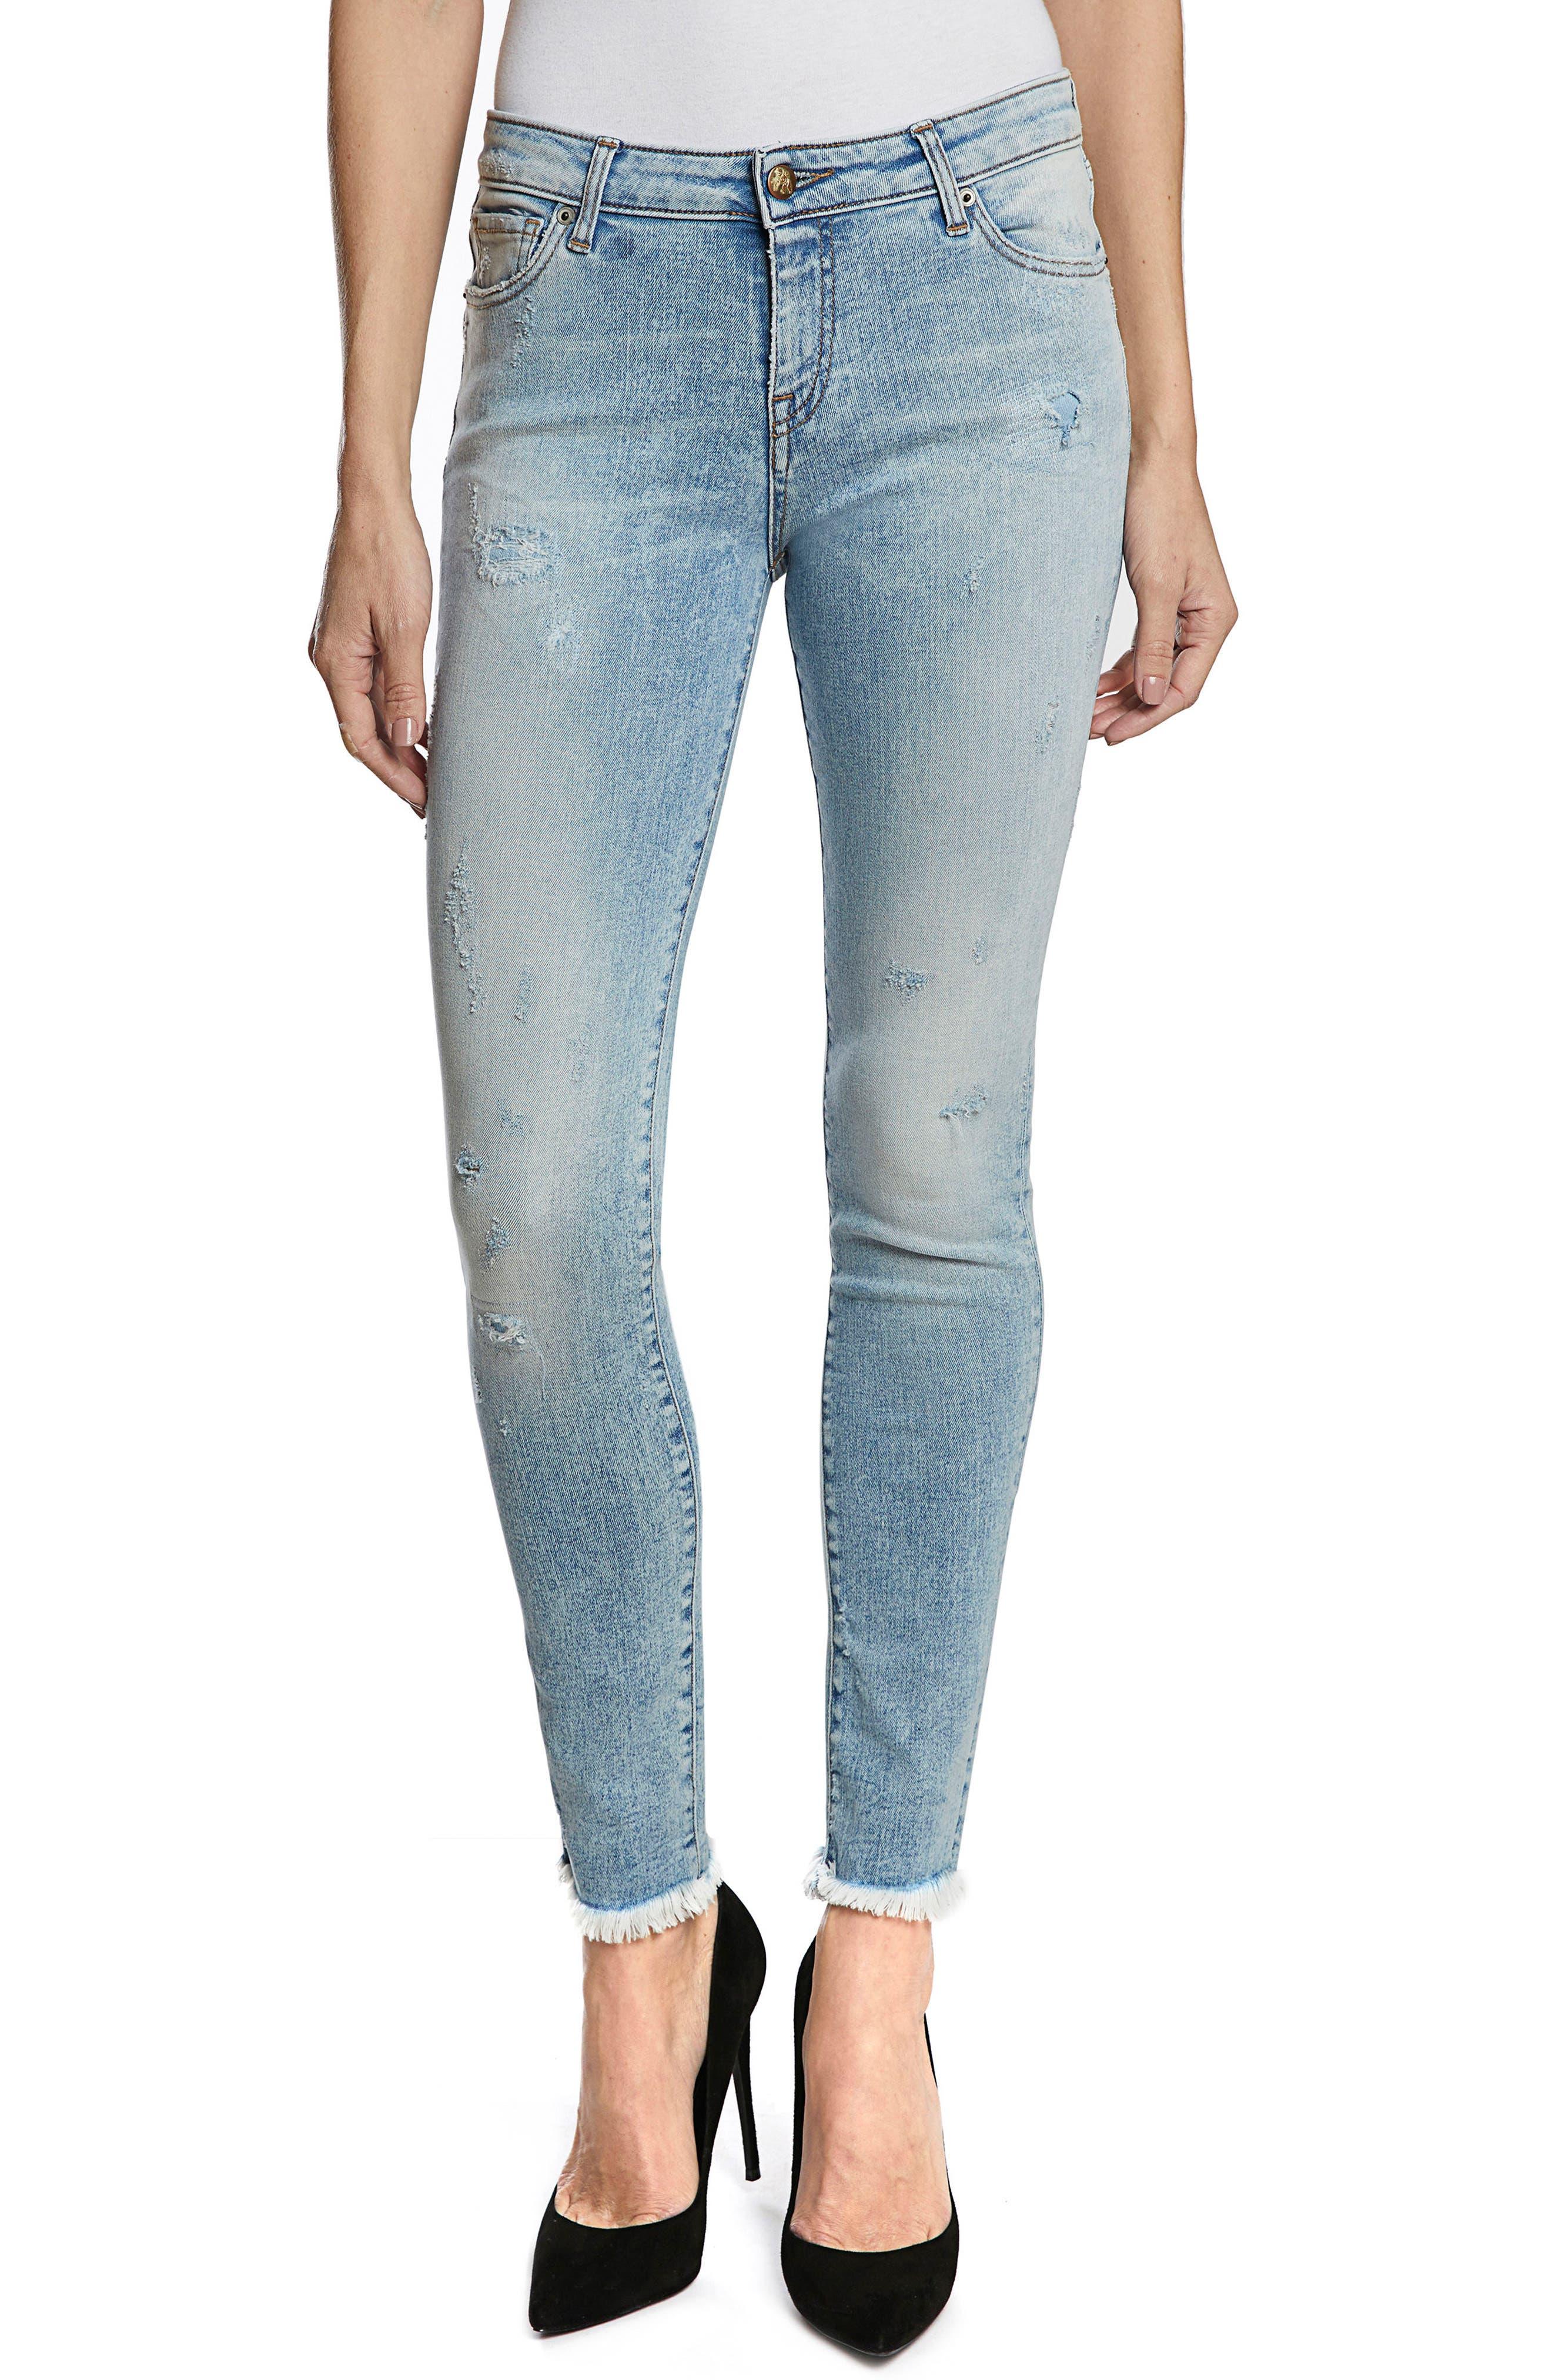 PRPS Camaro Ankle Skinny Jeans, Main, color, 490